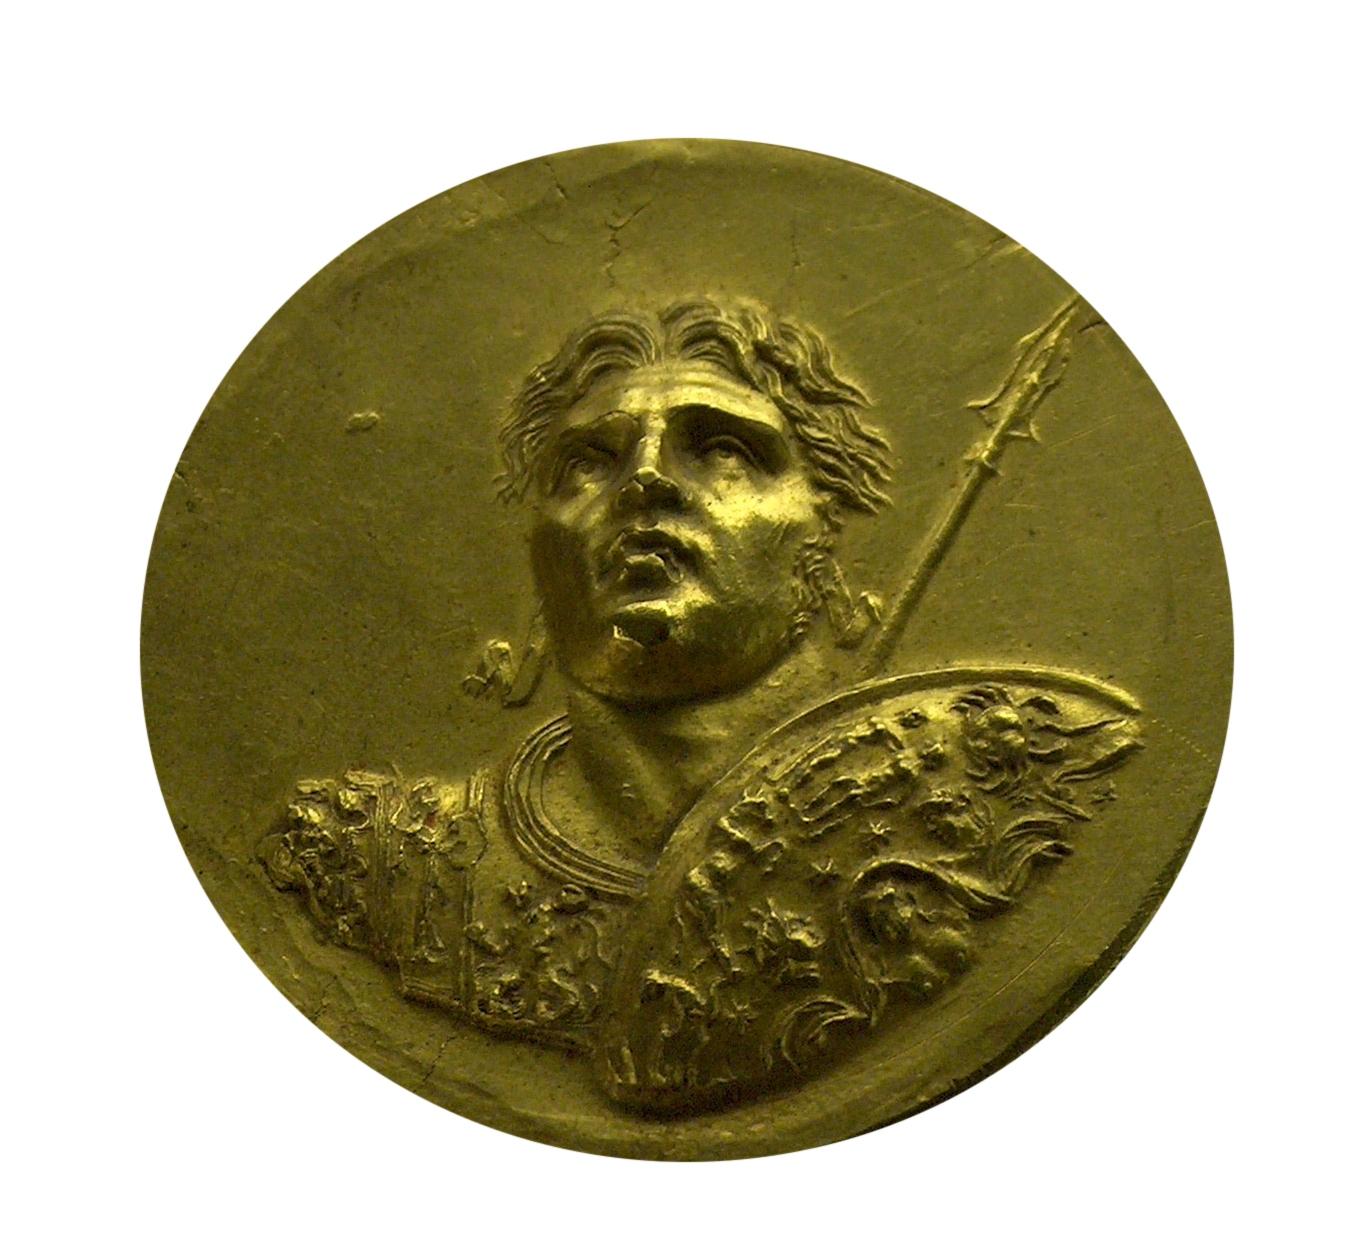 Gratis munten taxatie - Oude Griekse munt